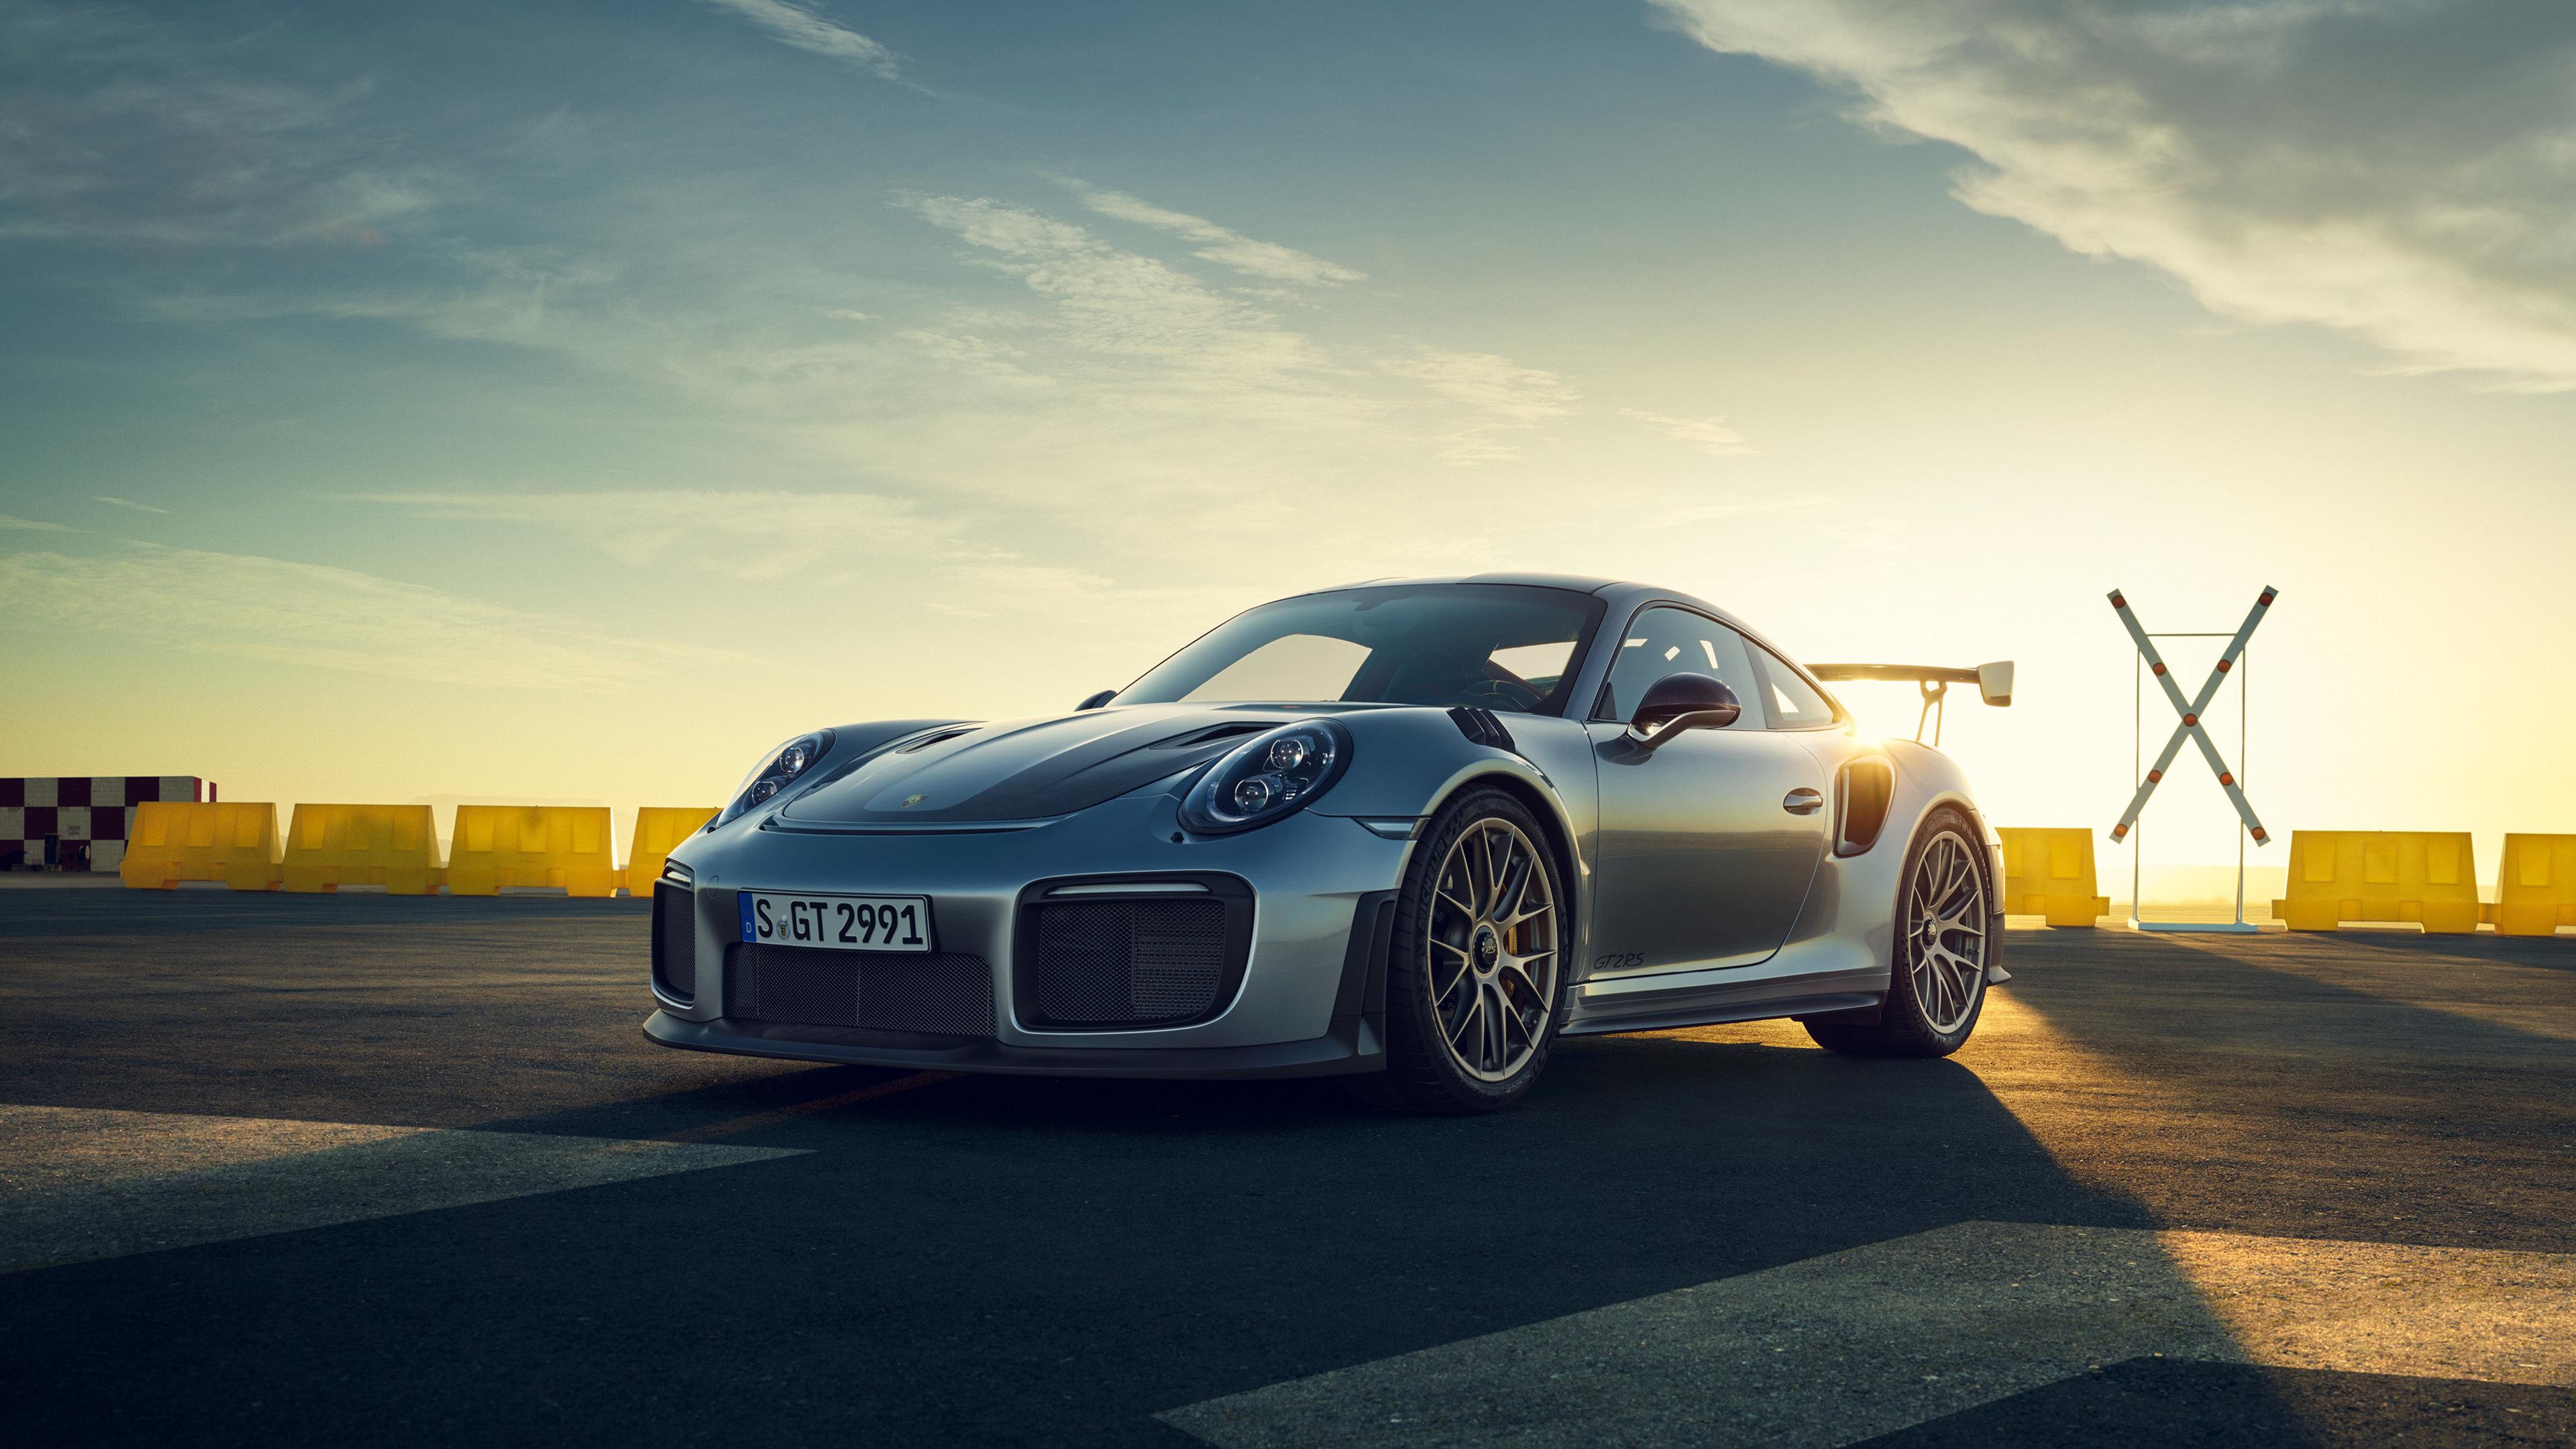 porsche 911 gt2 rs 4k 1539108586 - Porsche 911 GT2 RS 4k - porsche wallpapers, porsche 911 wallpapers, hd-wallpapers, cars wallpapers, behance wallpapers, 4k-wallpapers, 2018 cars wallpapers